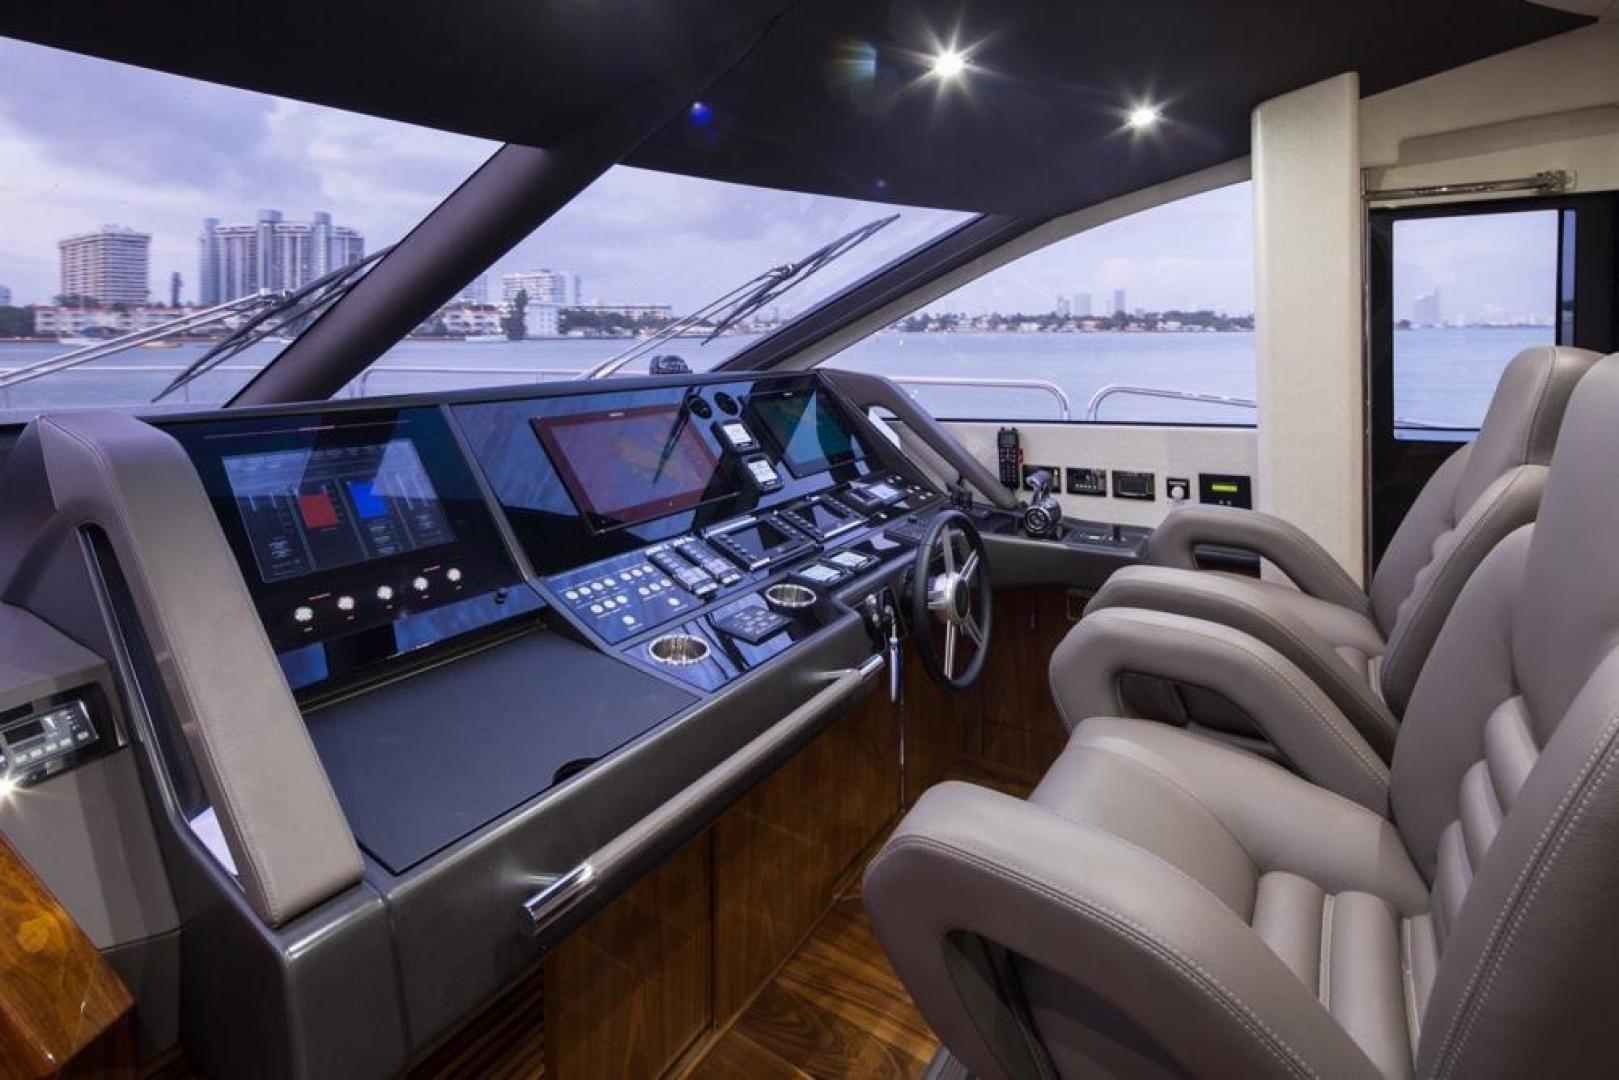 Sunseeker-28 Metre Yacht 2016-RIII Miami-Florida-United States-2016 SUNSEEKER 92 RIII FOR SALE-600101 | Thumbnail